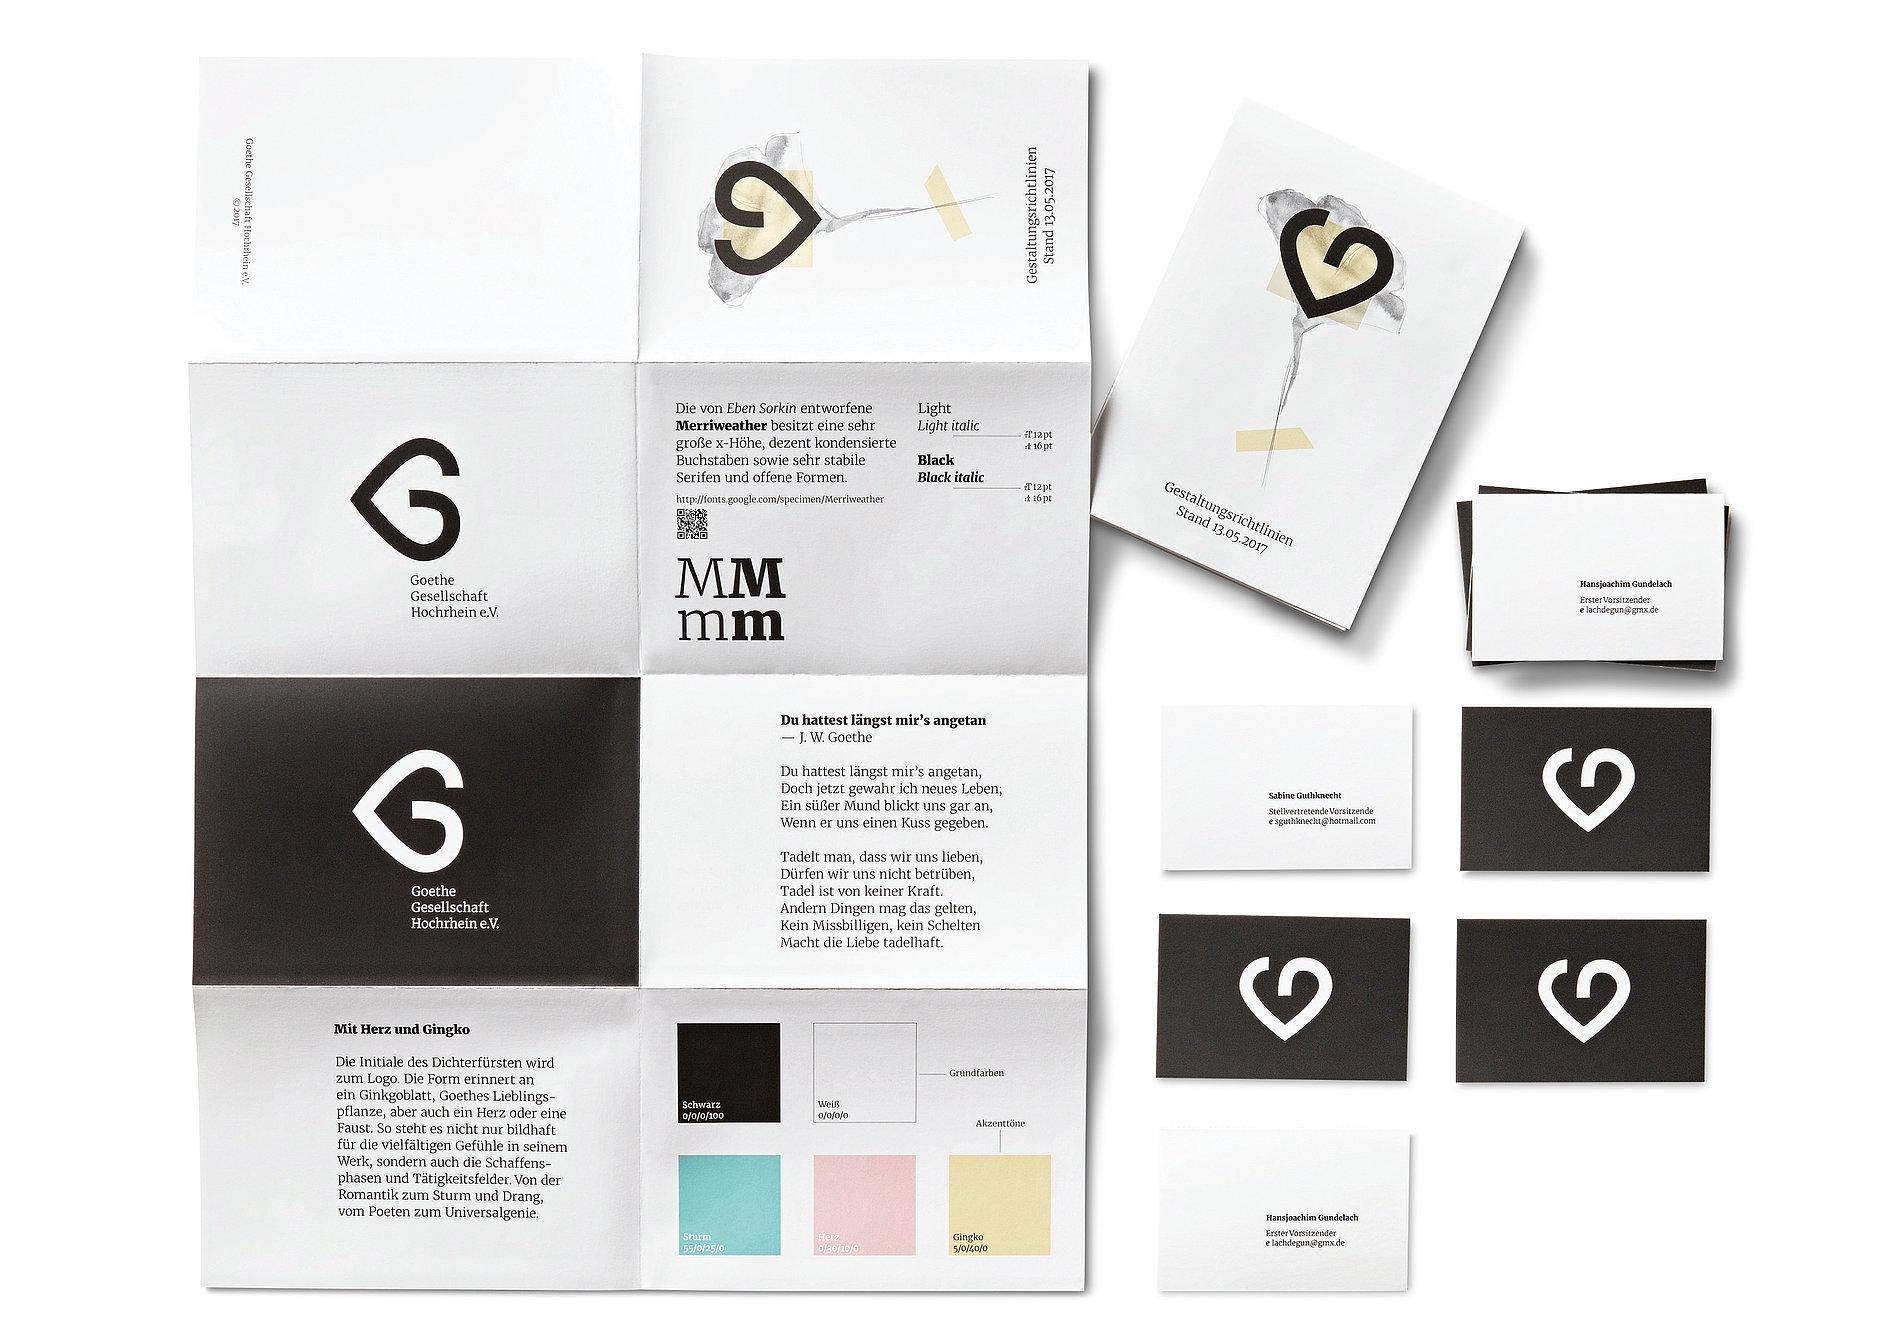 Goethe-Gesellschaft Hochrhein | Red Dot Design Award